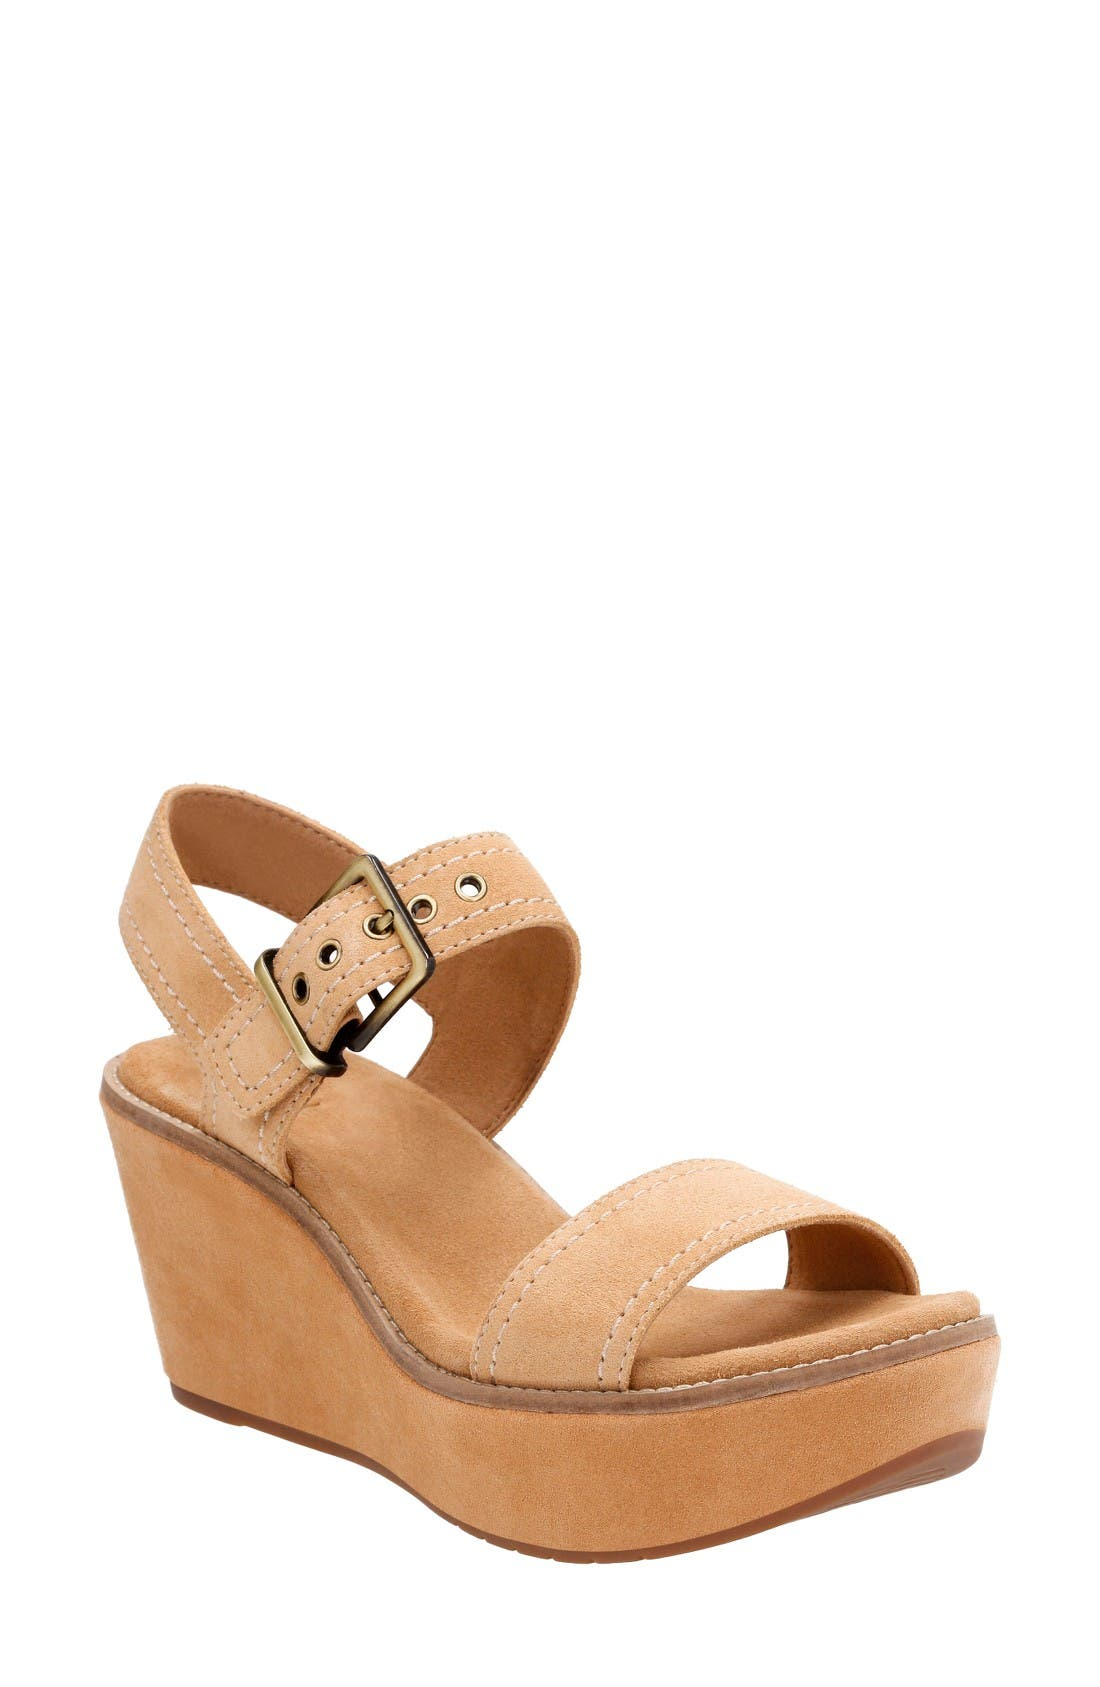 Clarks® Aisley Orchid Wedge Sandal (Women)